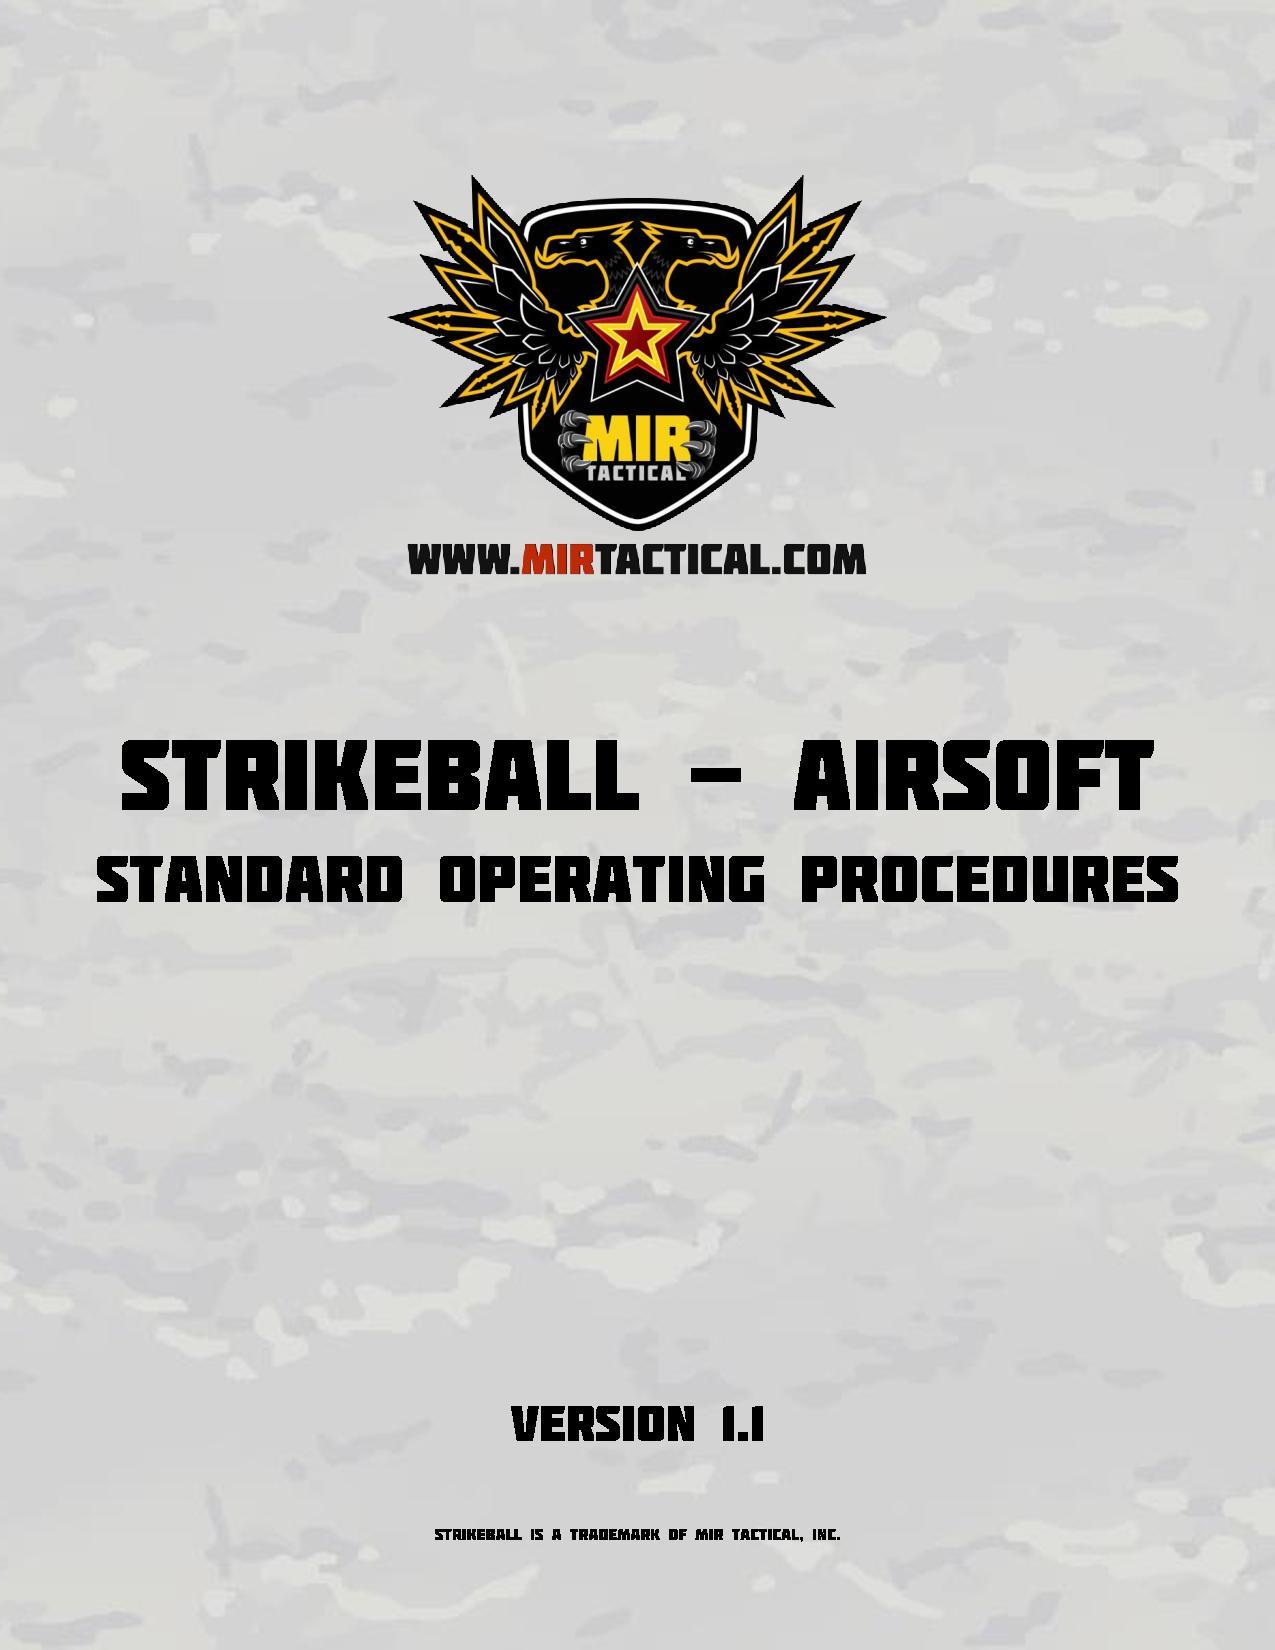 mir-tactical-strikeball-airsoft-sop-v1.1-page-001.jpg